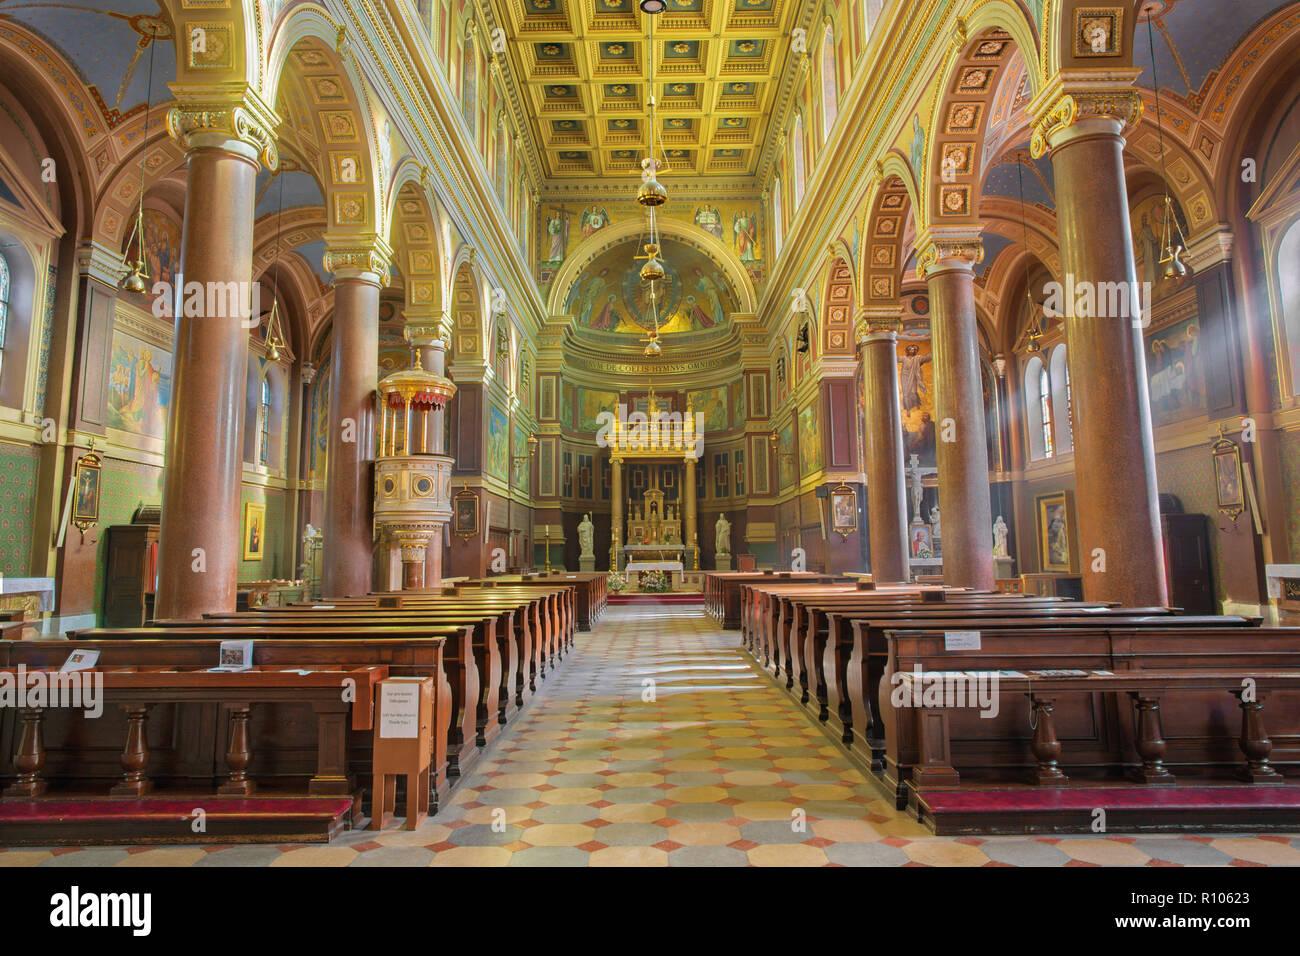 PRAGUE, CZECH REPUBLIC - OCTOBER 13, 2018: The nave of church kostel Svatého Václava. Stock Photo